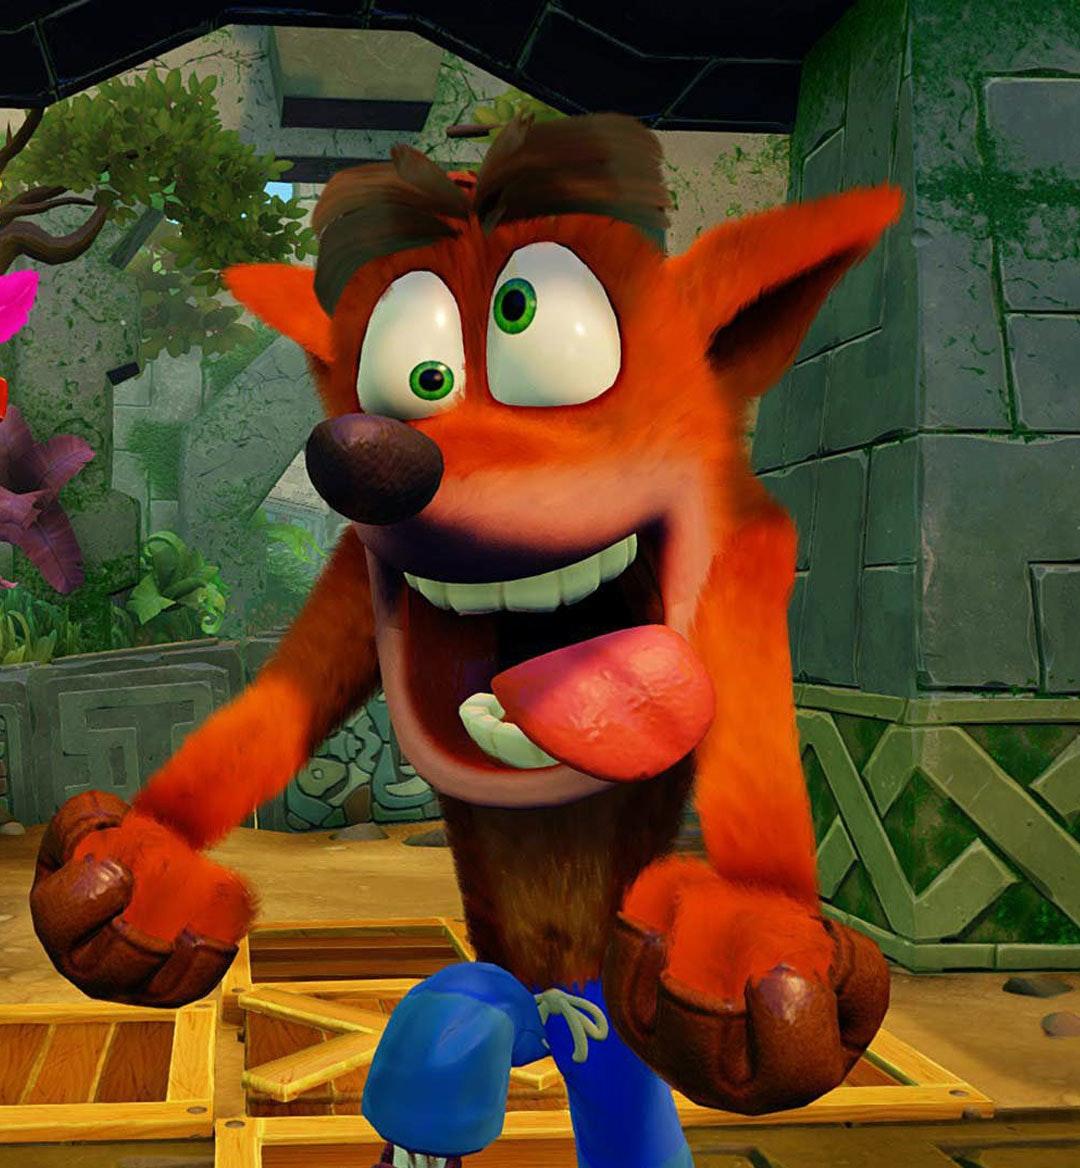 Crash Bandicoot mobileimage